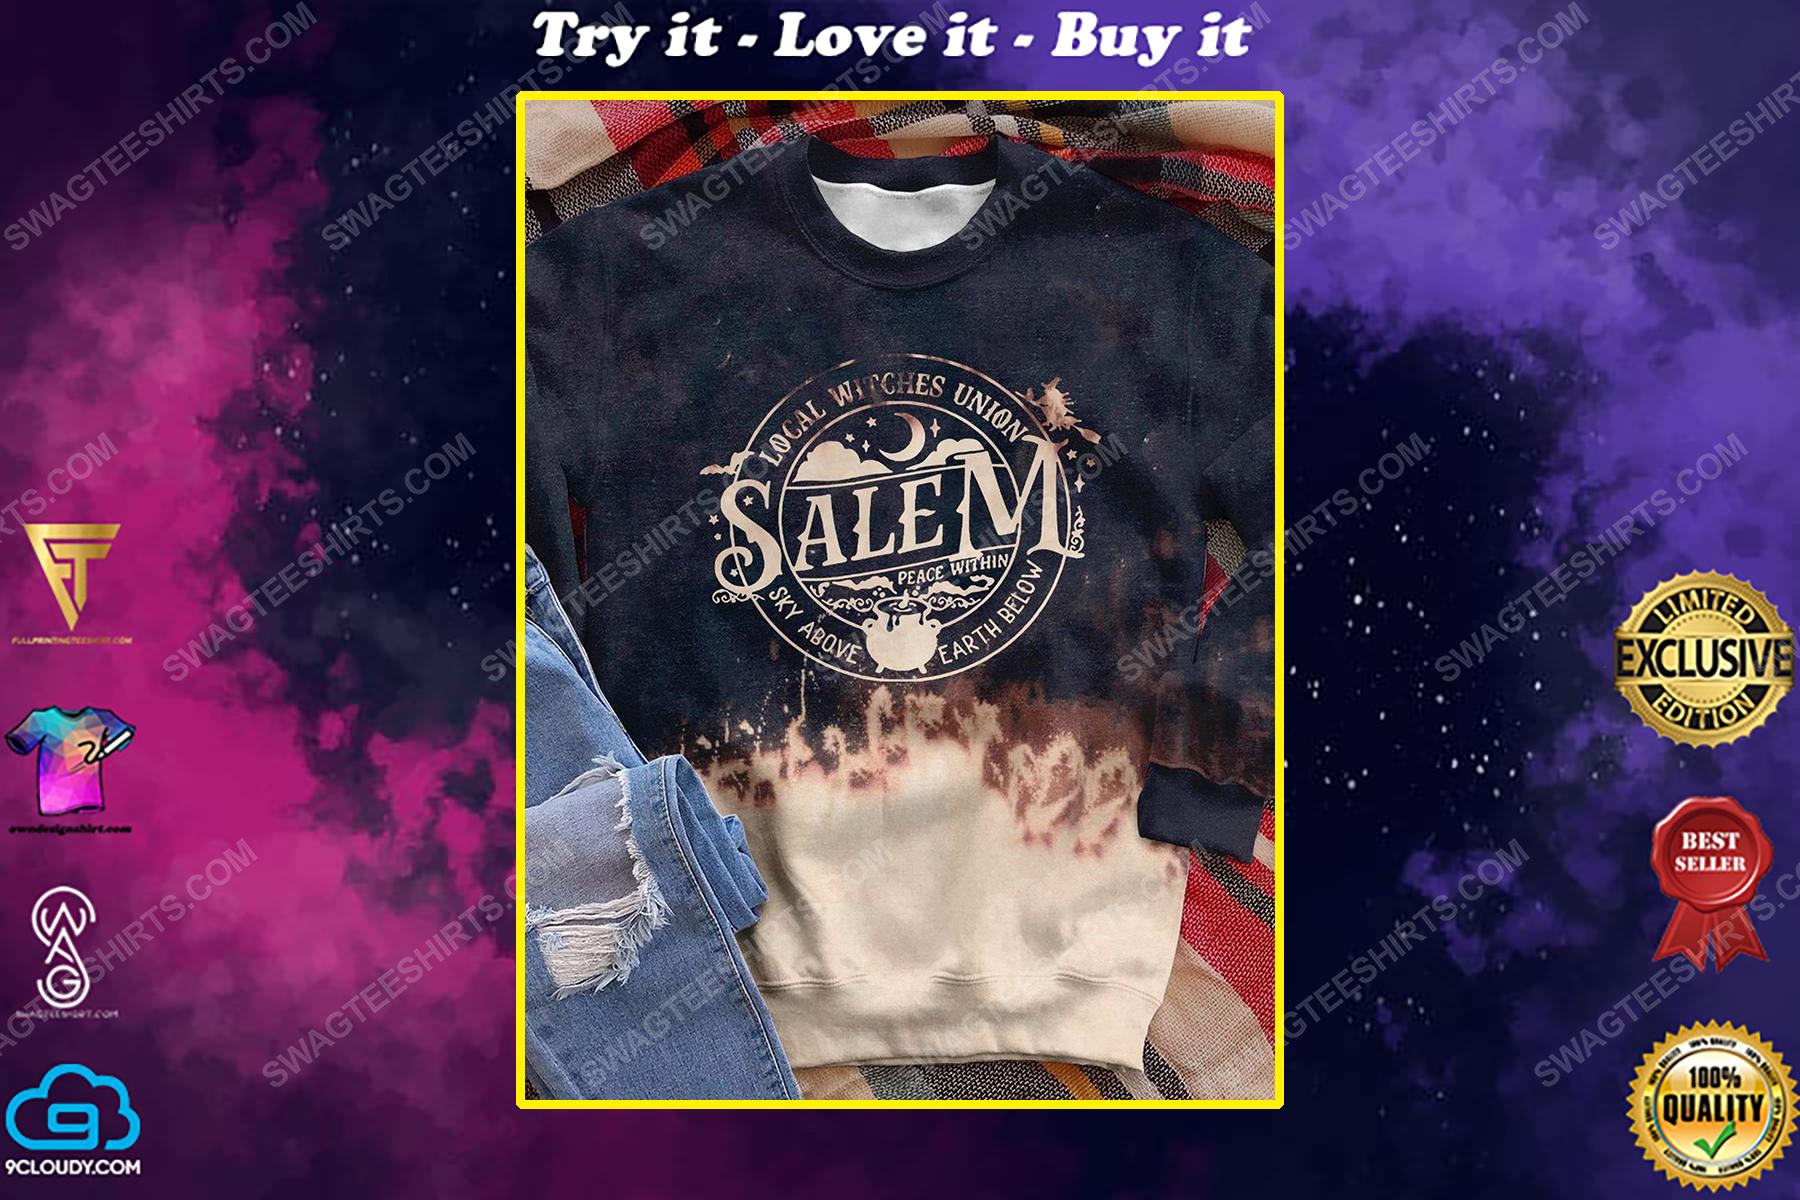 Halloween night local witches union salem shirt